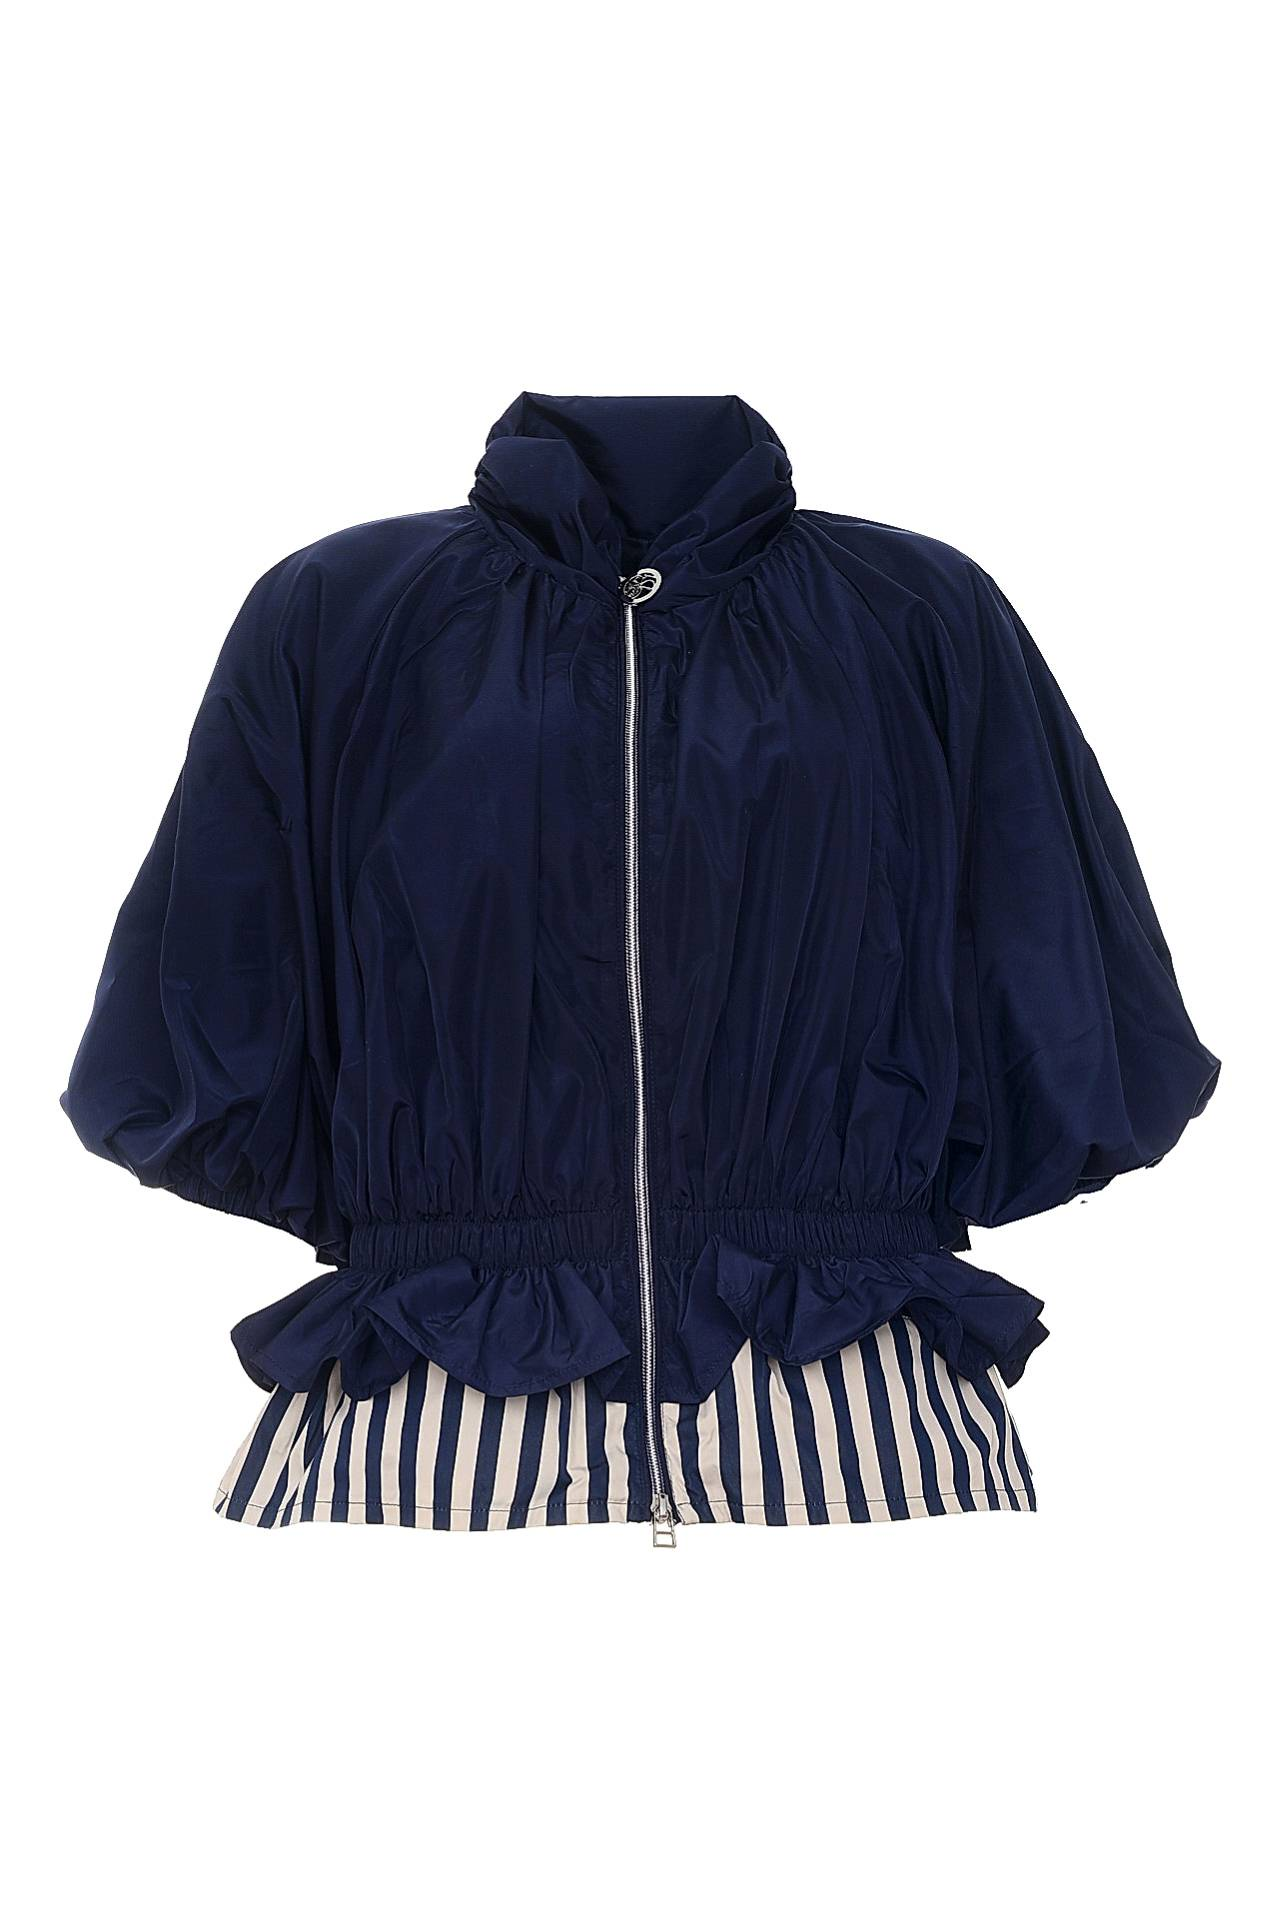 Куртка ODRI mo вентилятора mofi 2 huawei rongyao ping защитный рукав кобуры пластина 8 дюймов jdn w09 al00 вызова tablet пакет рукав темно синий